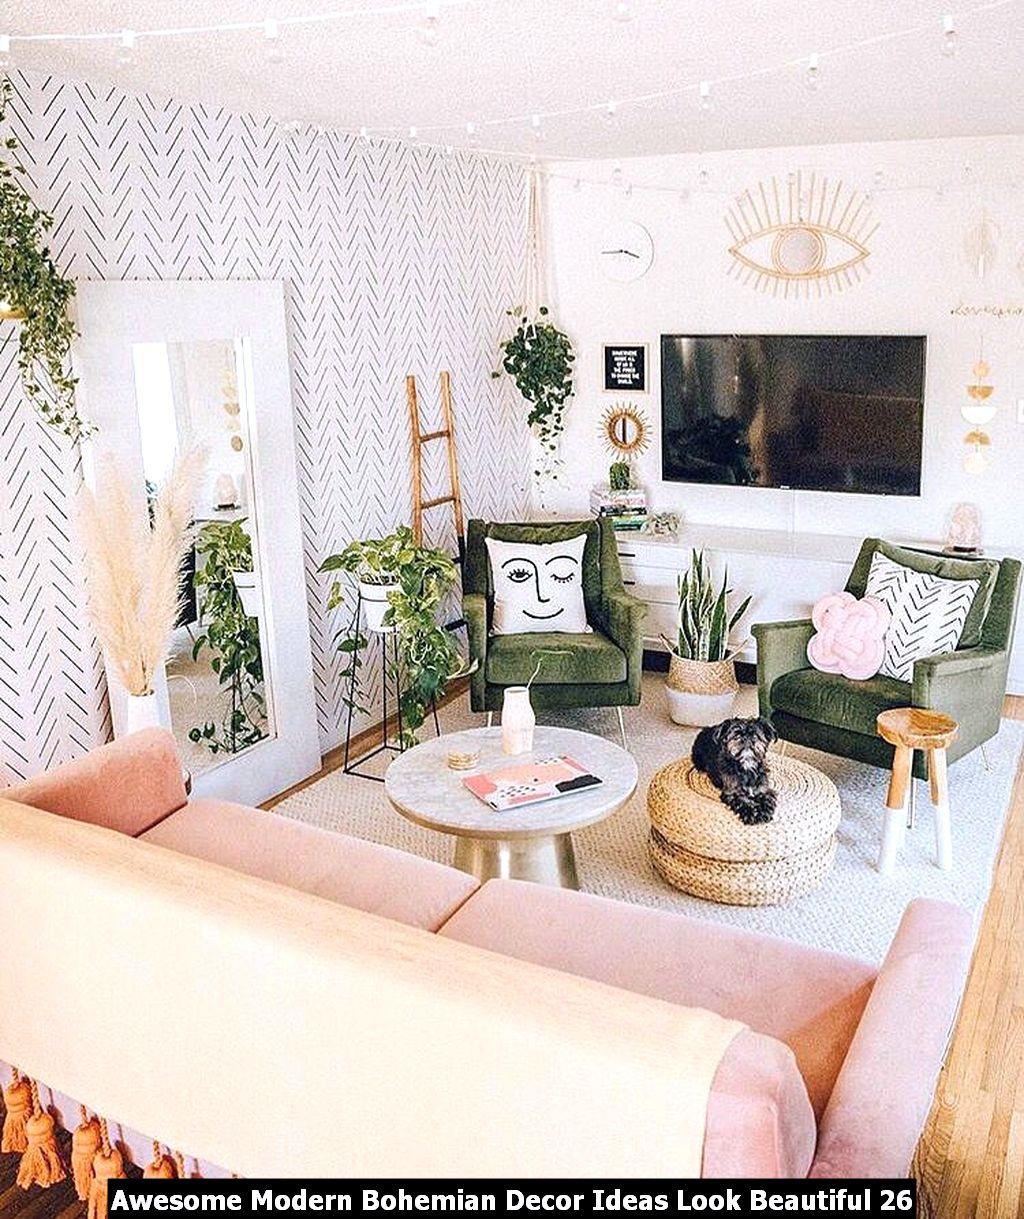 Awesome Modern Bohemian Decor Ideas Look Beautiful 26